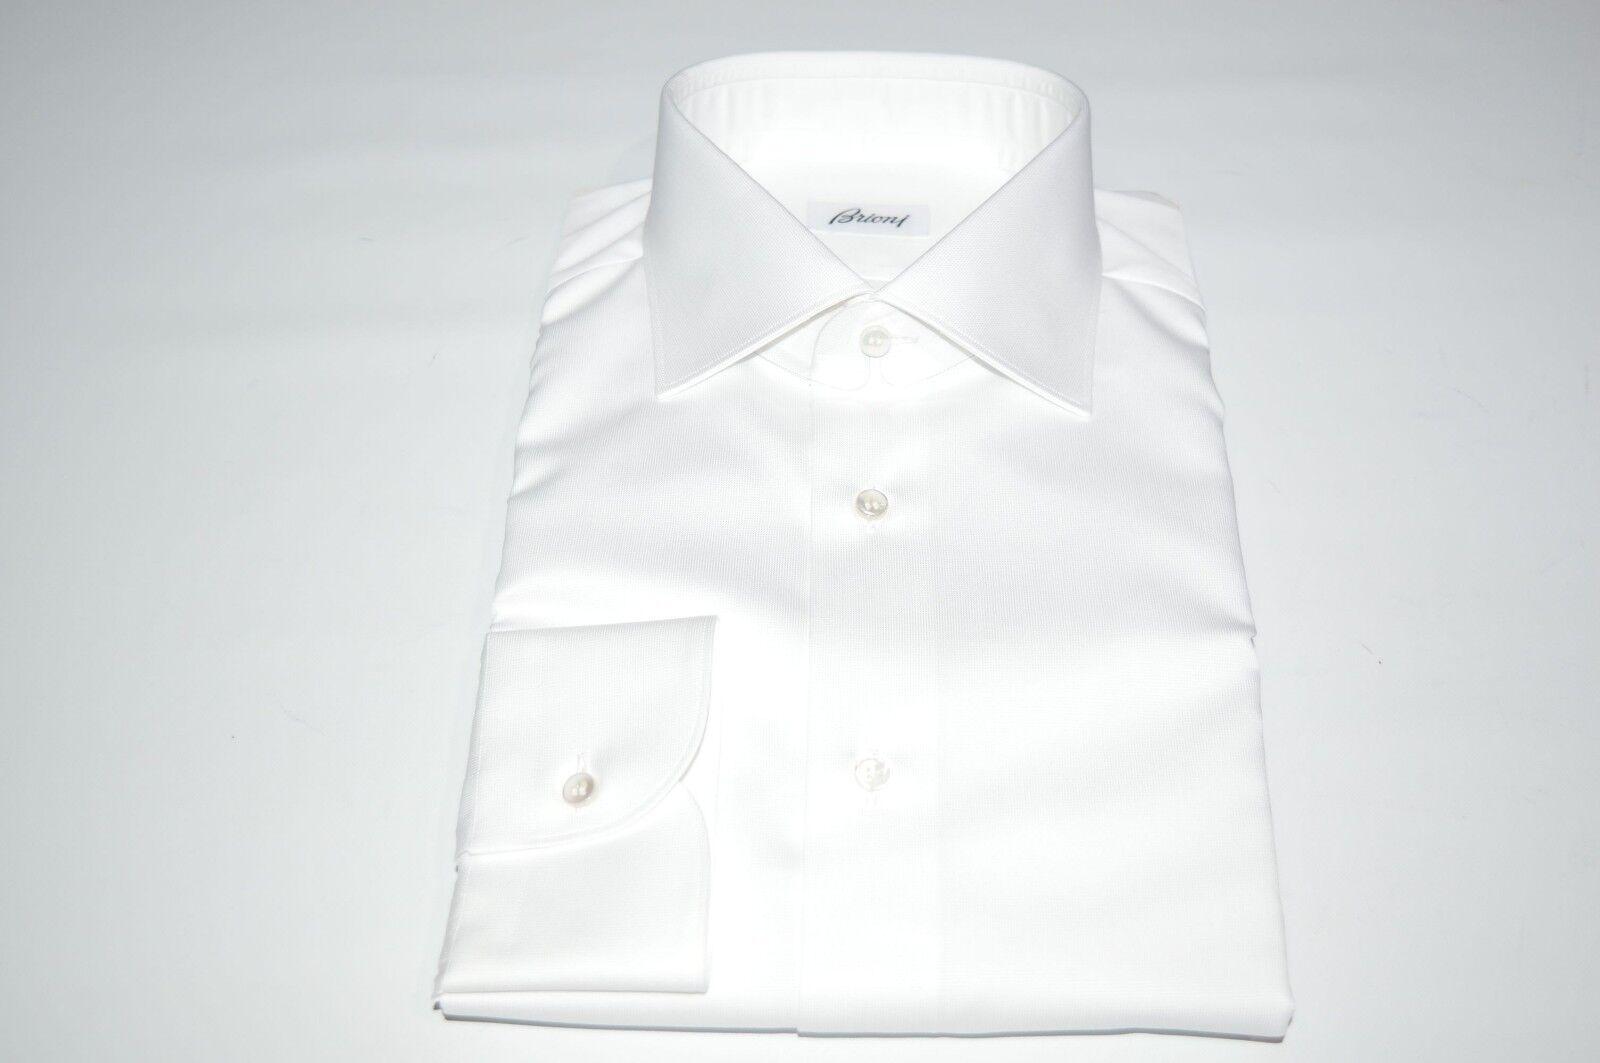 NEW  BRIONI Dress White SHIRT 100% Cotton Size 16.5 Us 42 Eu  (SE31)